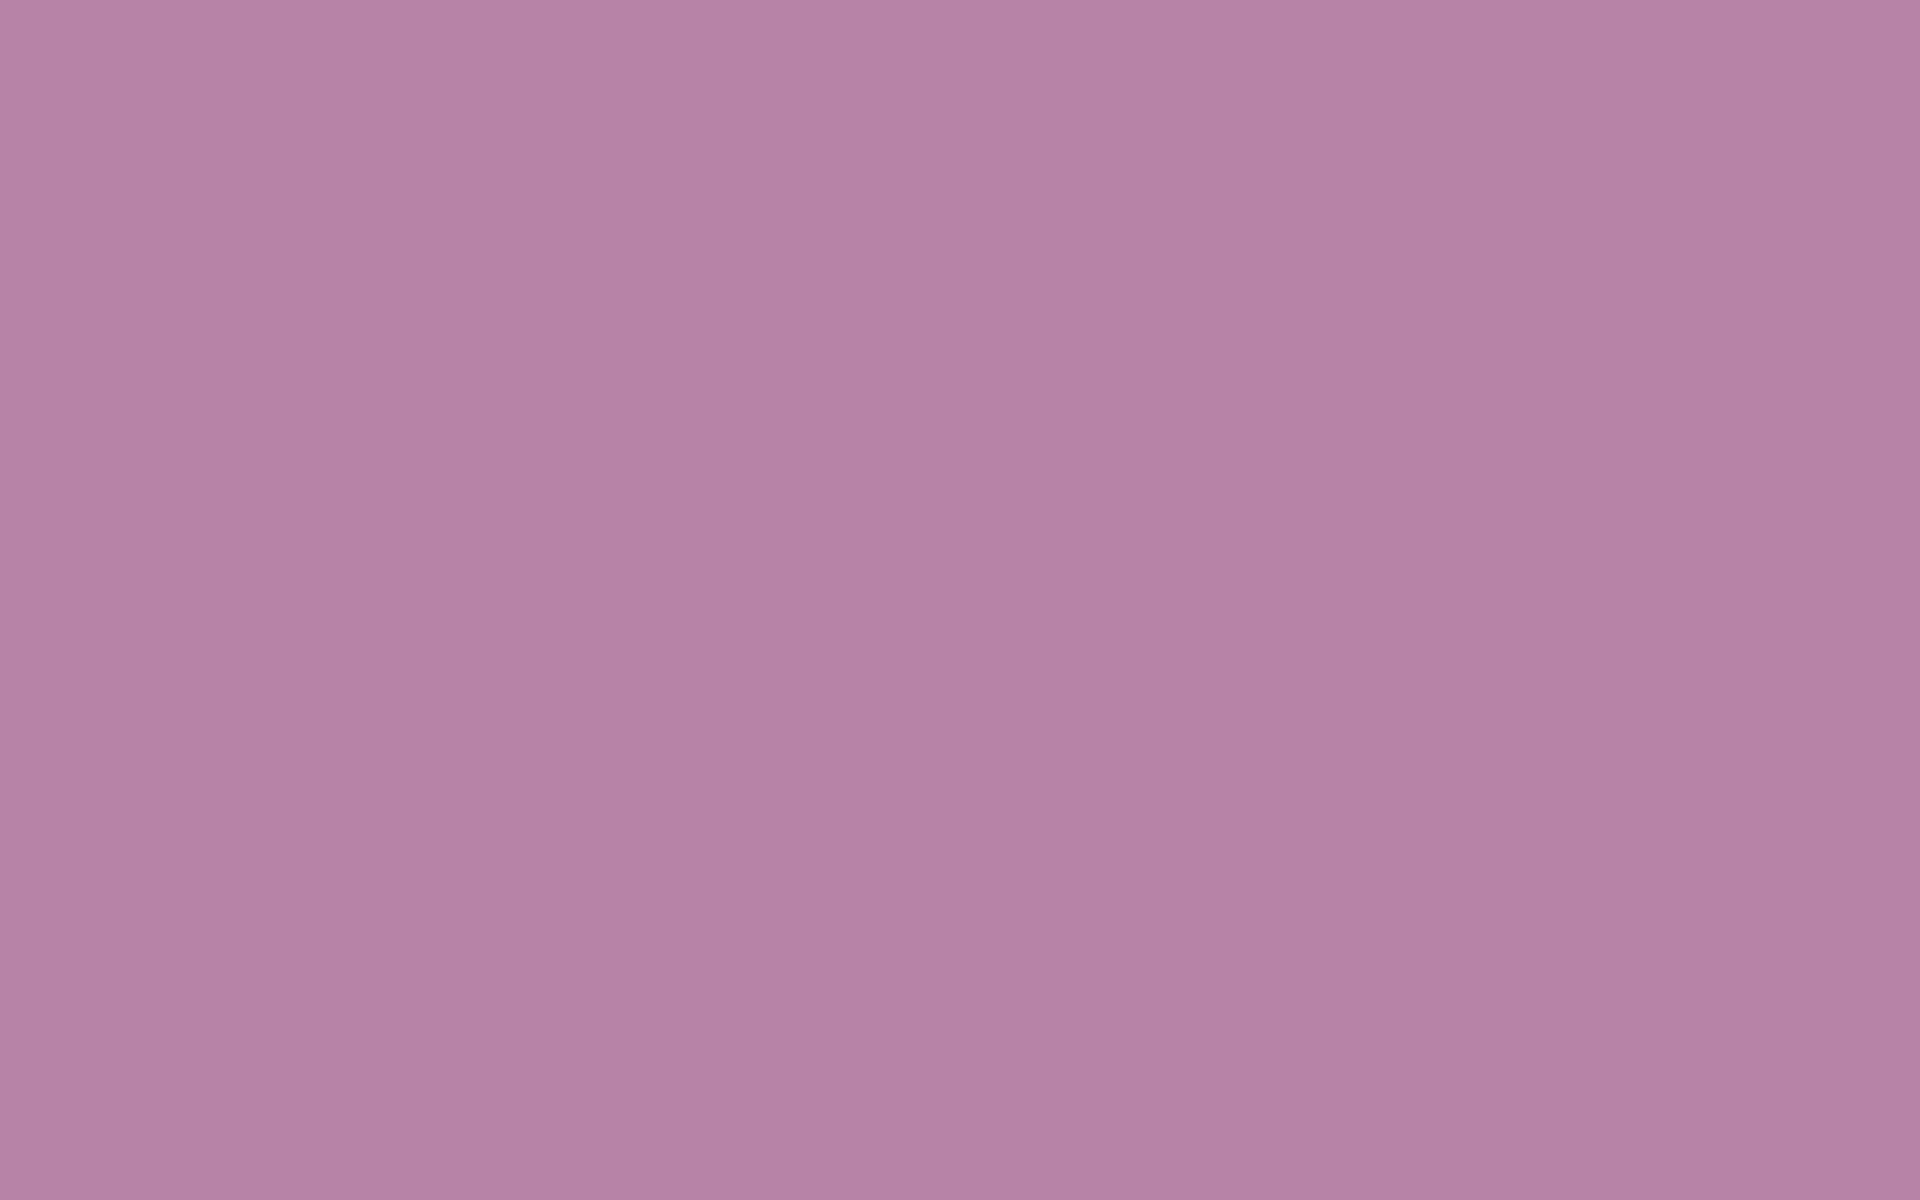 1920x1200 Opera Mauve Solid Color Background